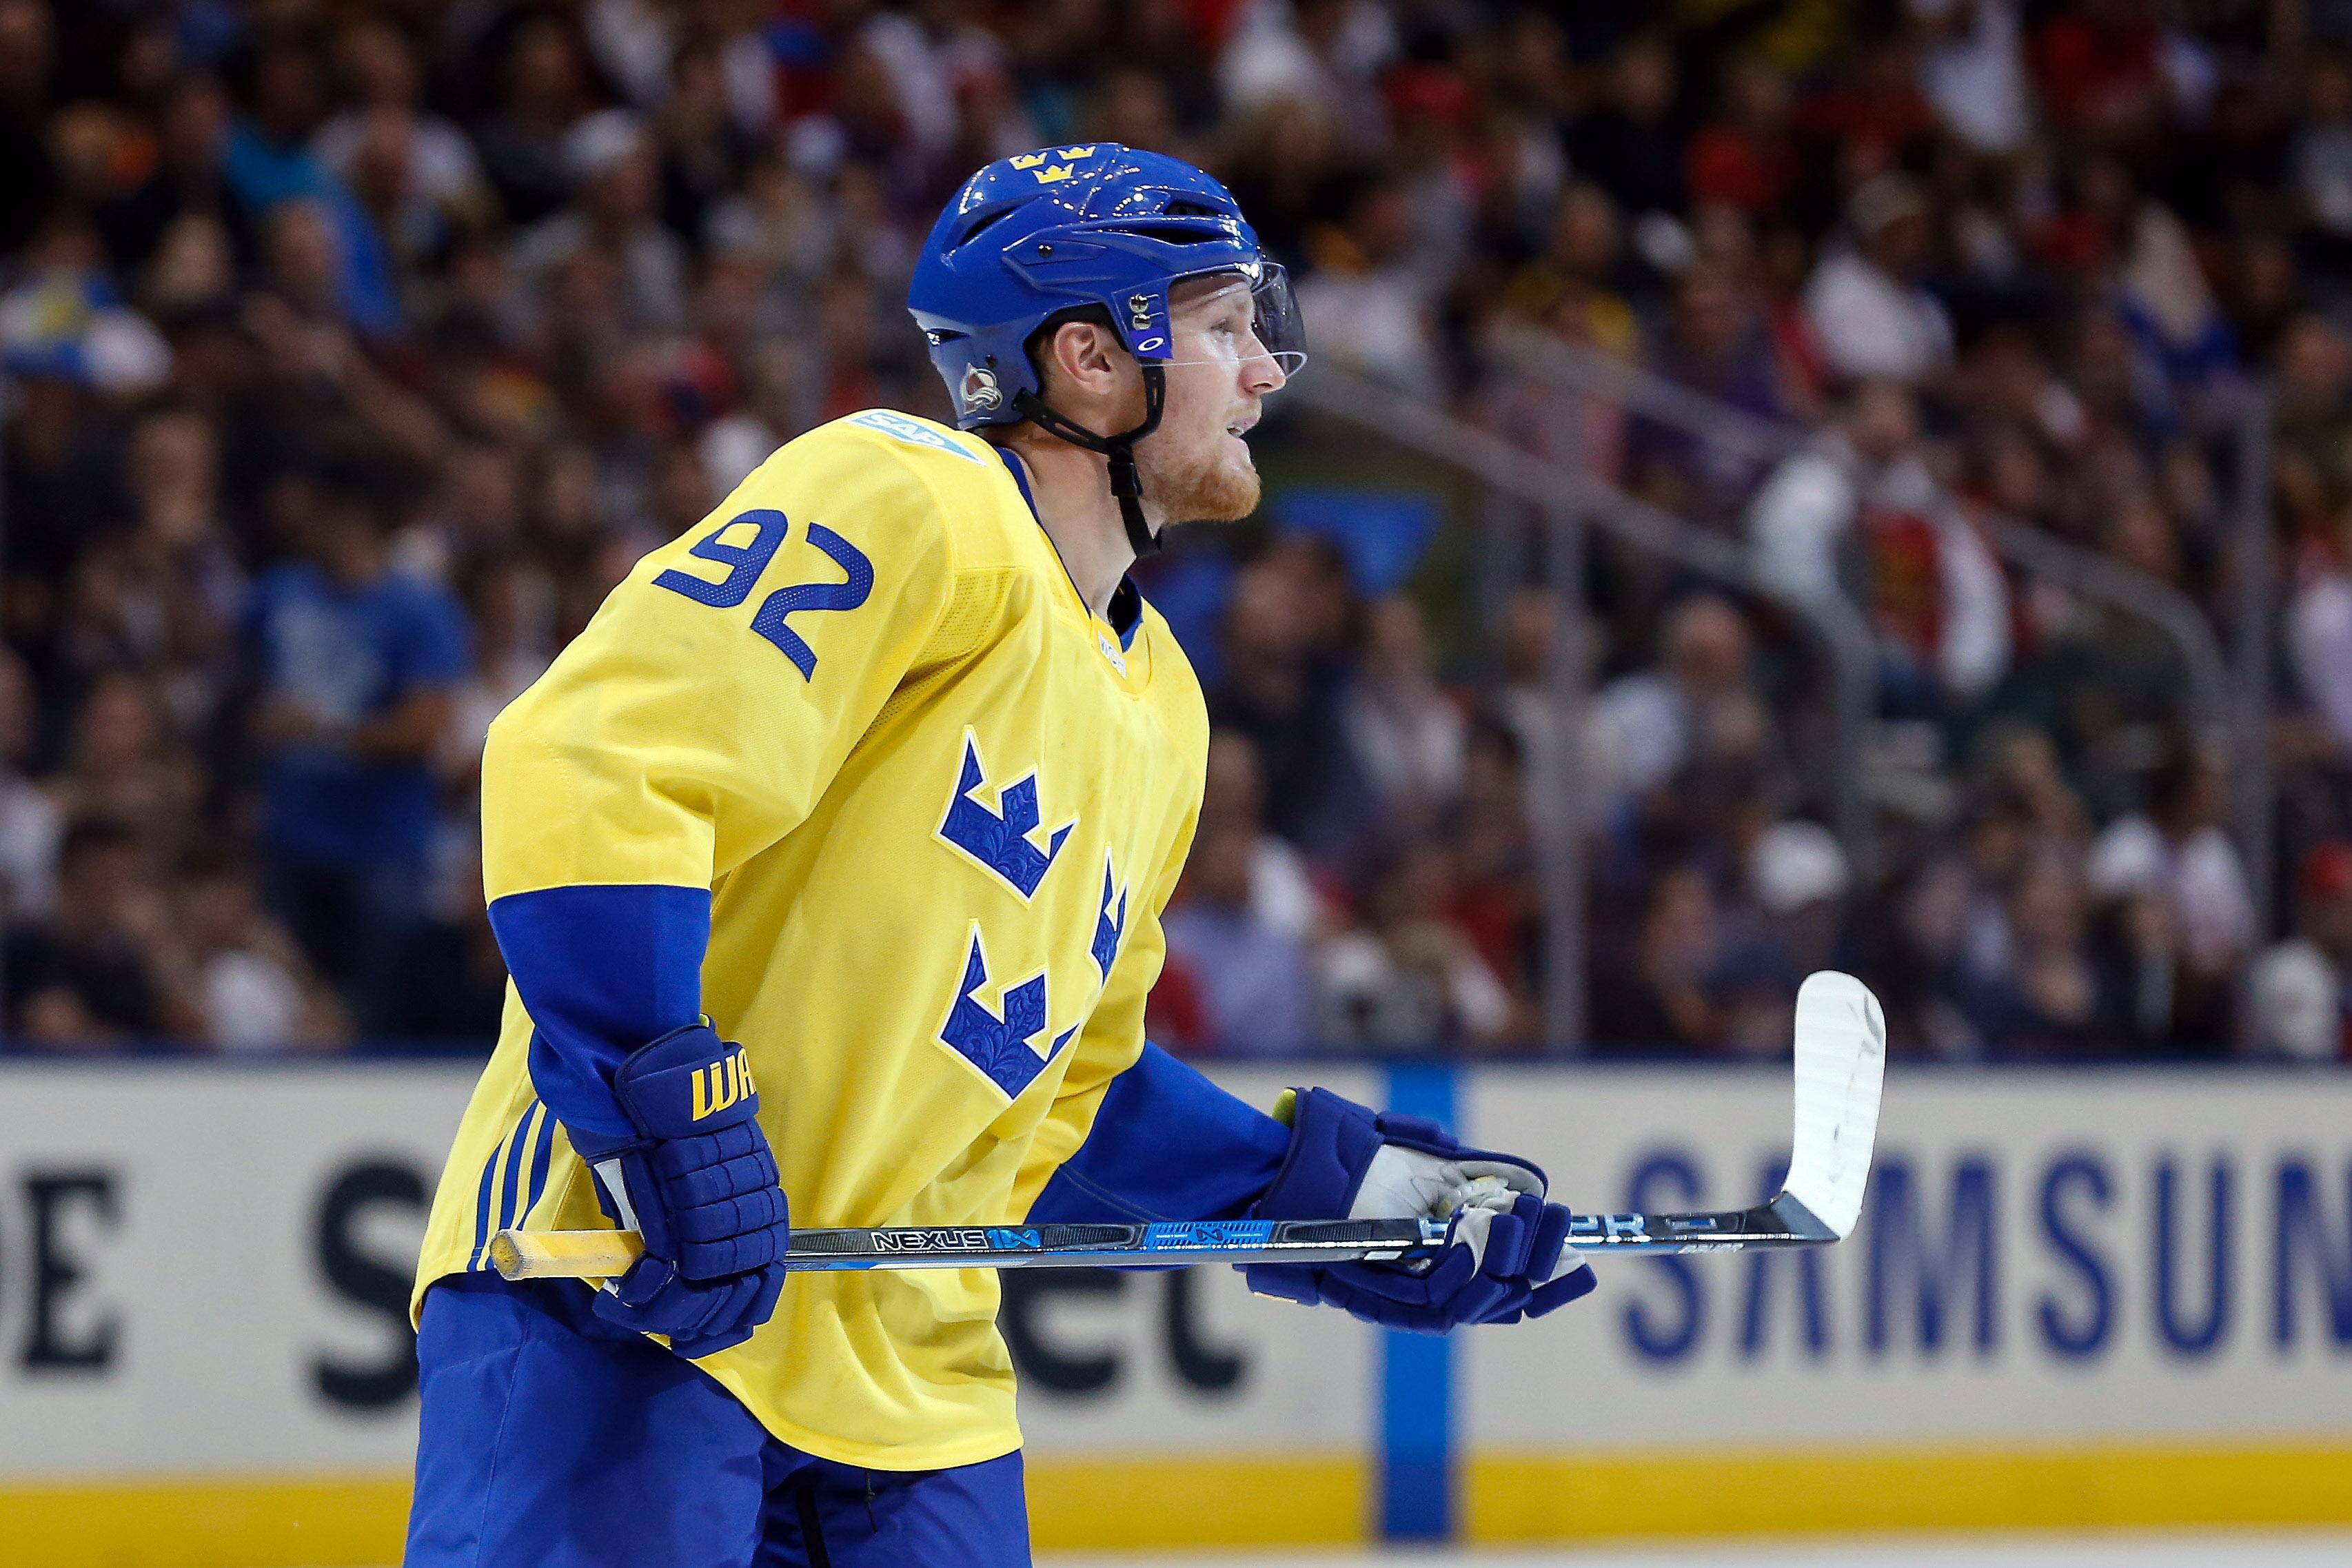 Hockey: World Cup of Hockey-Team Russia vs Team Sweden